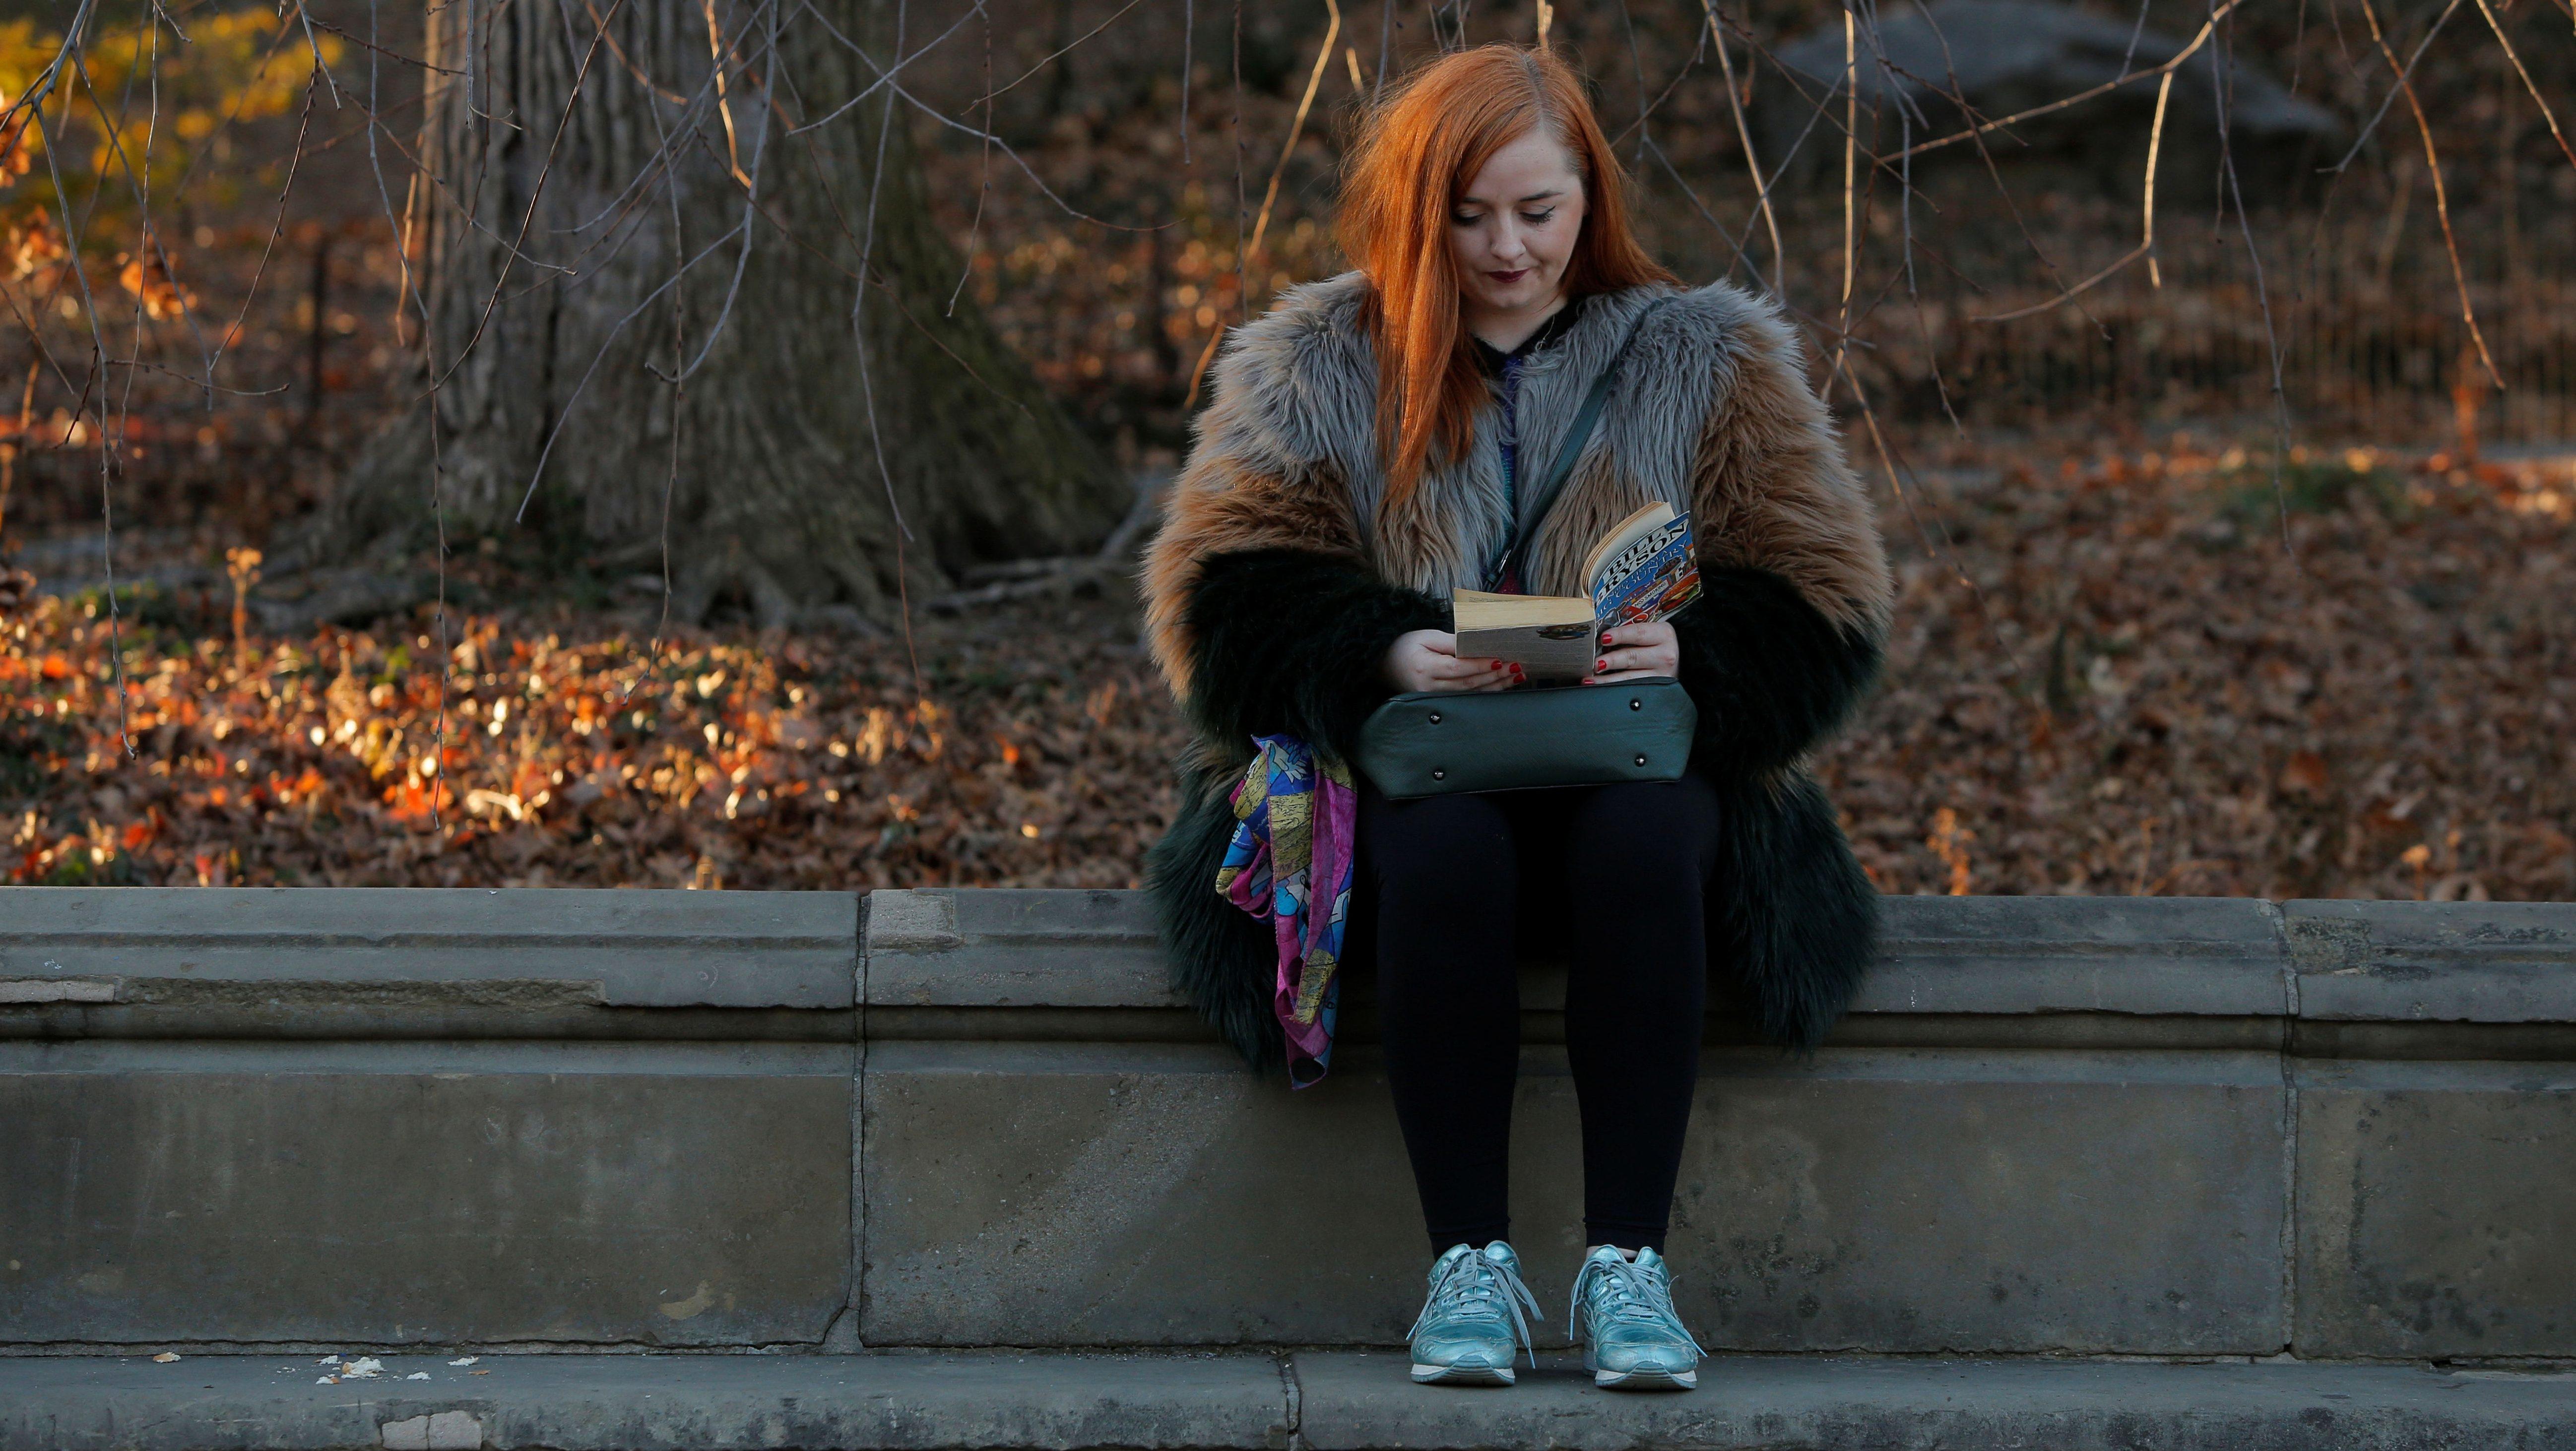 reading freely